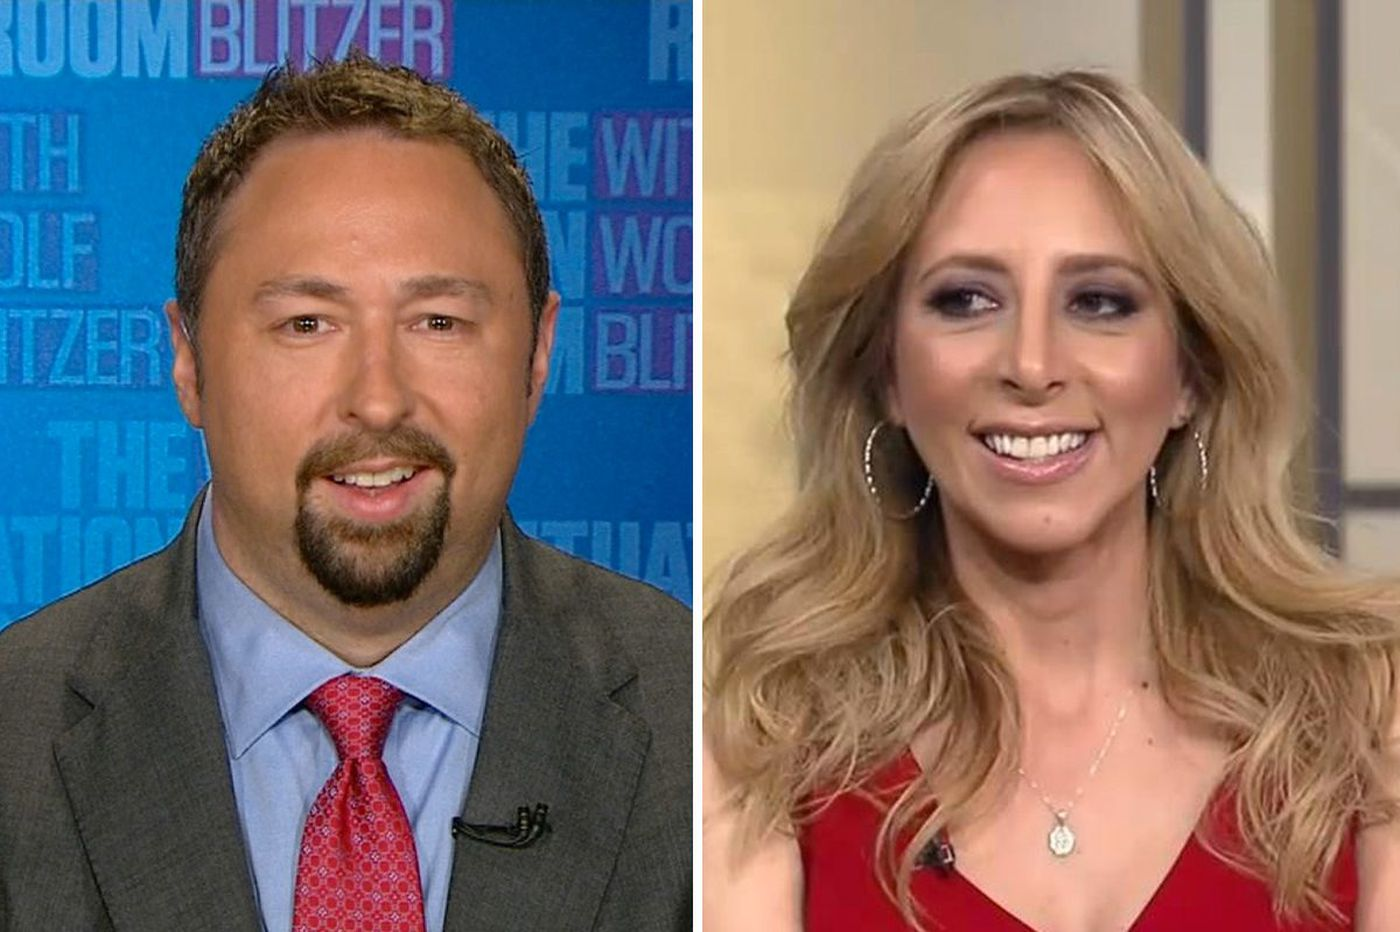 Ex-Trump staffer Jason Miller out at CNN after abortion allegation